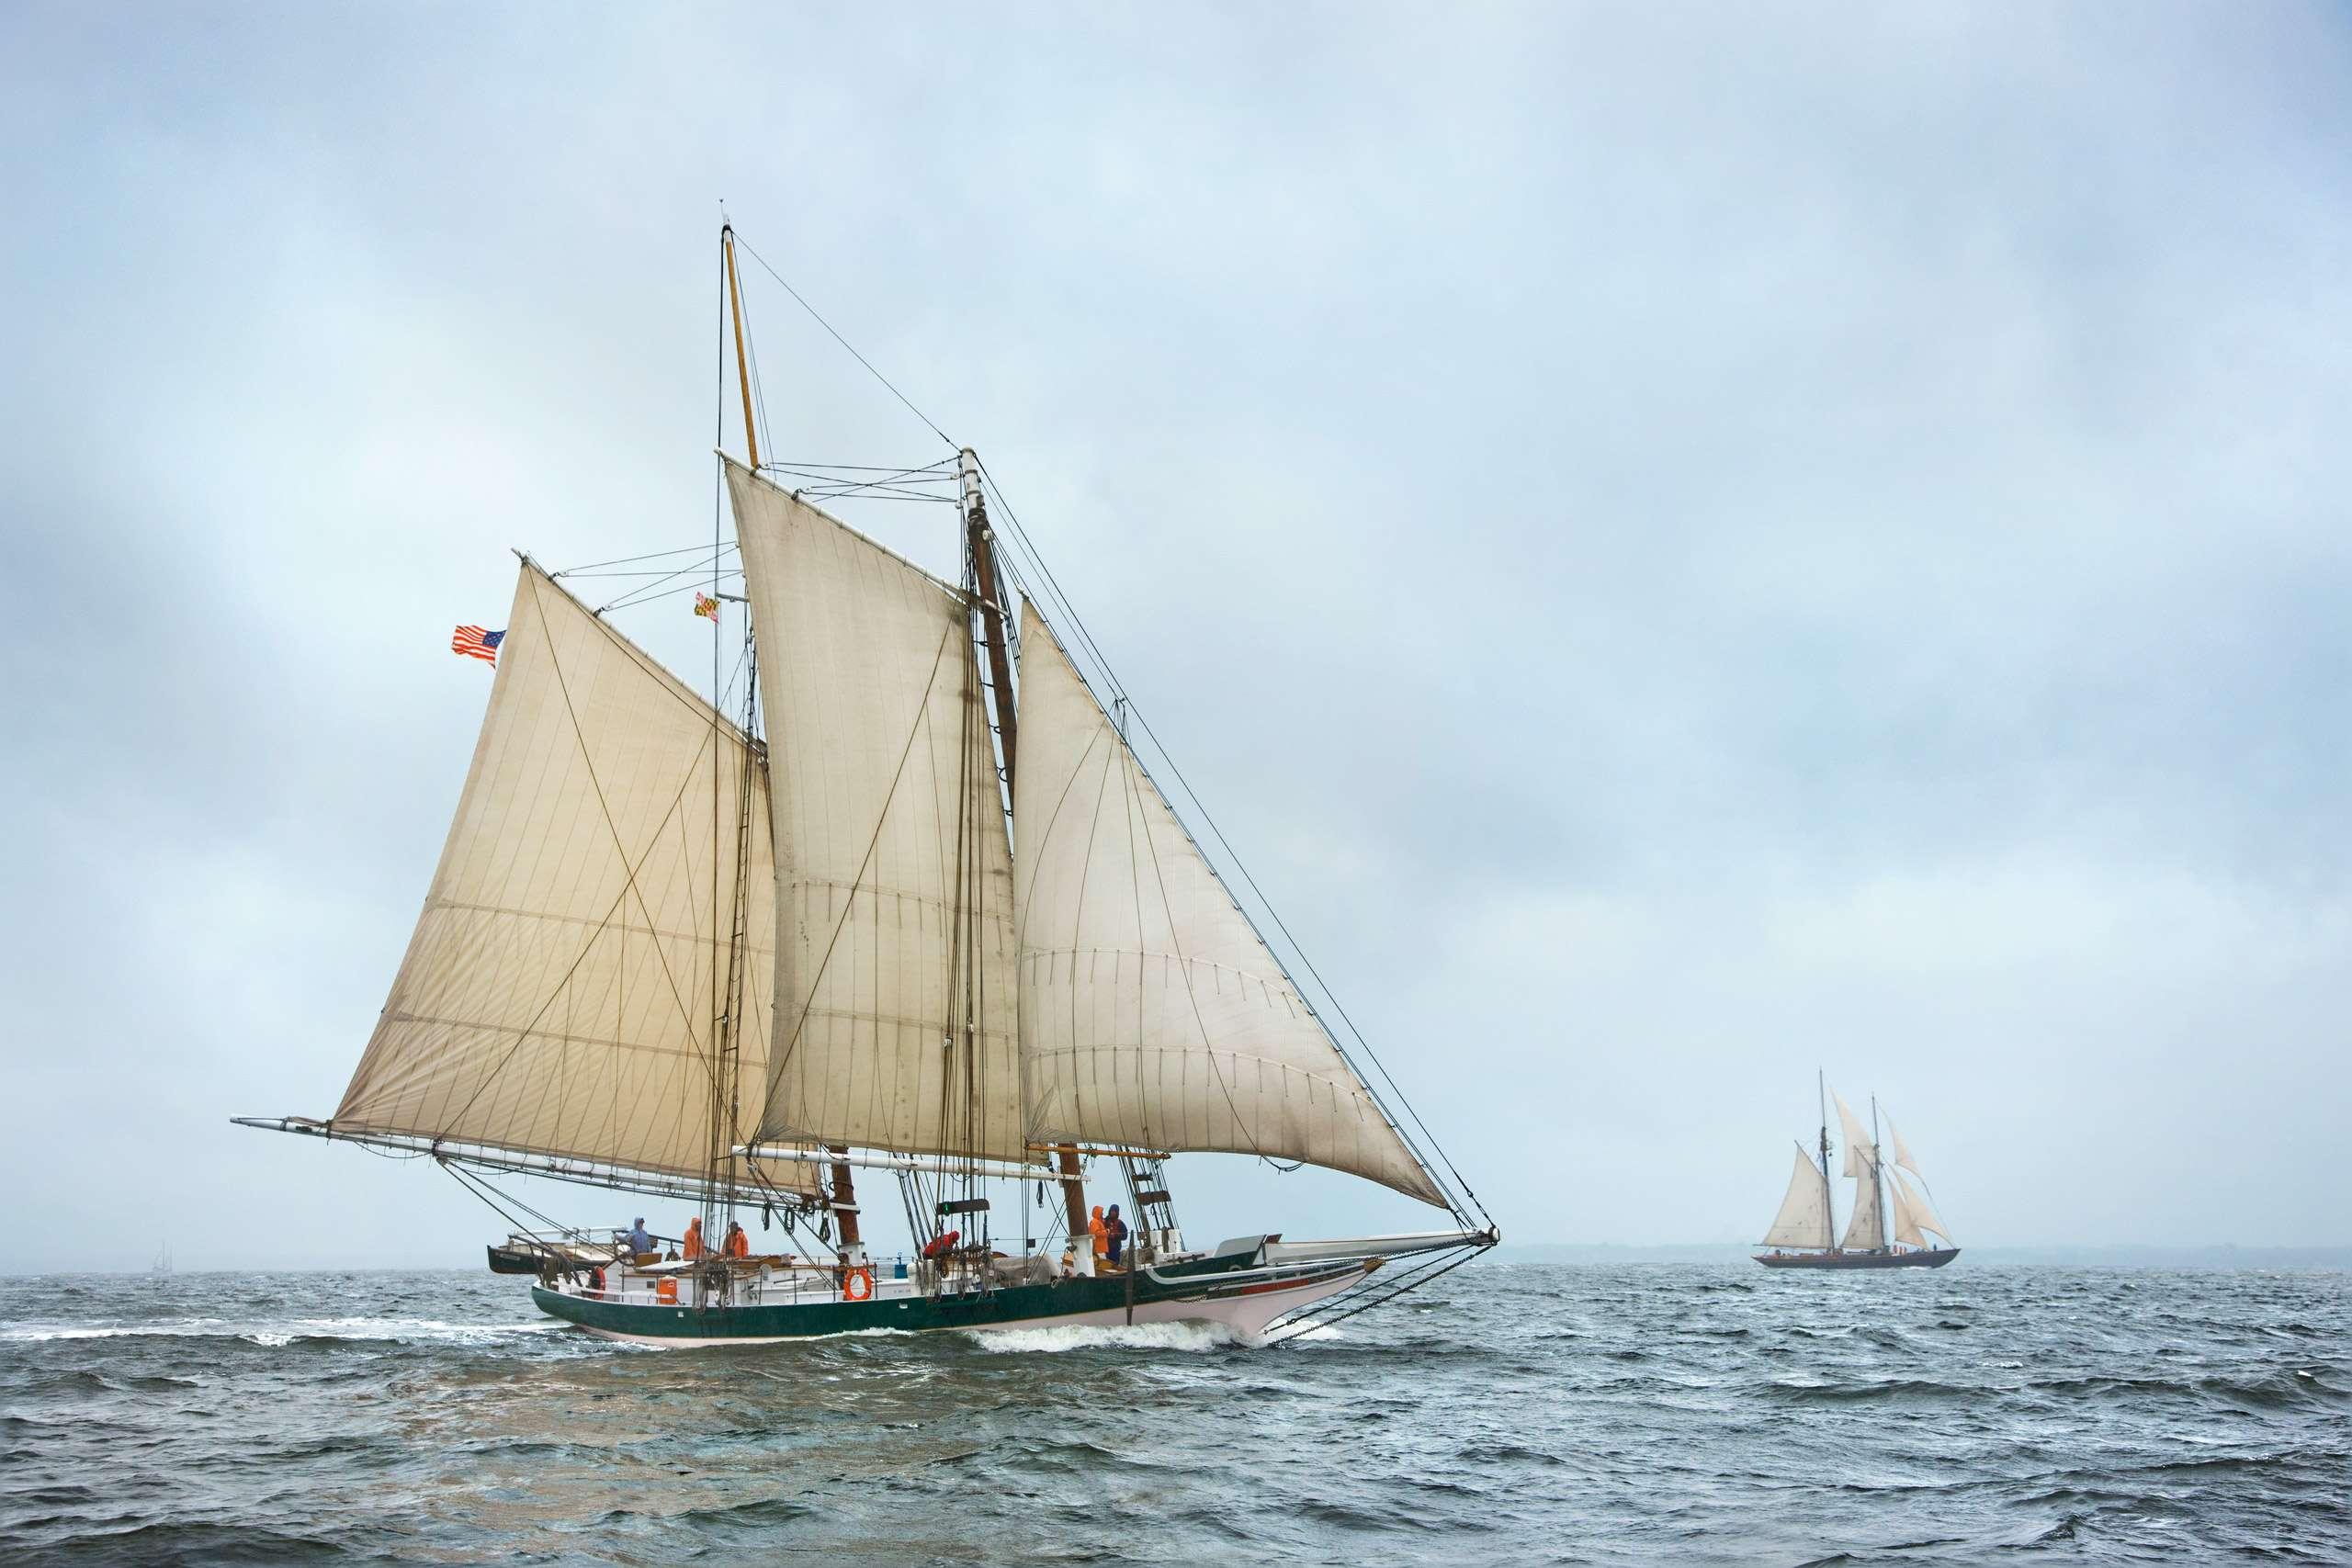 PORTFOLIO - Sailing - Tall Ships #3 - PCG602